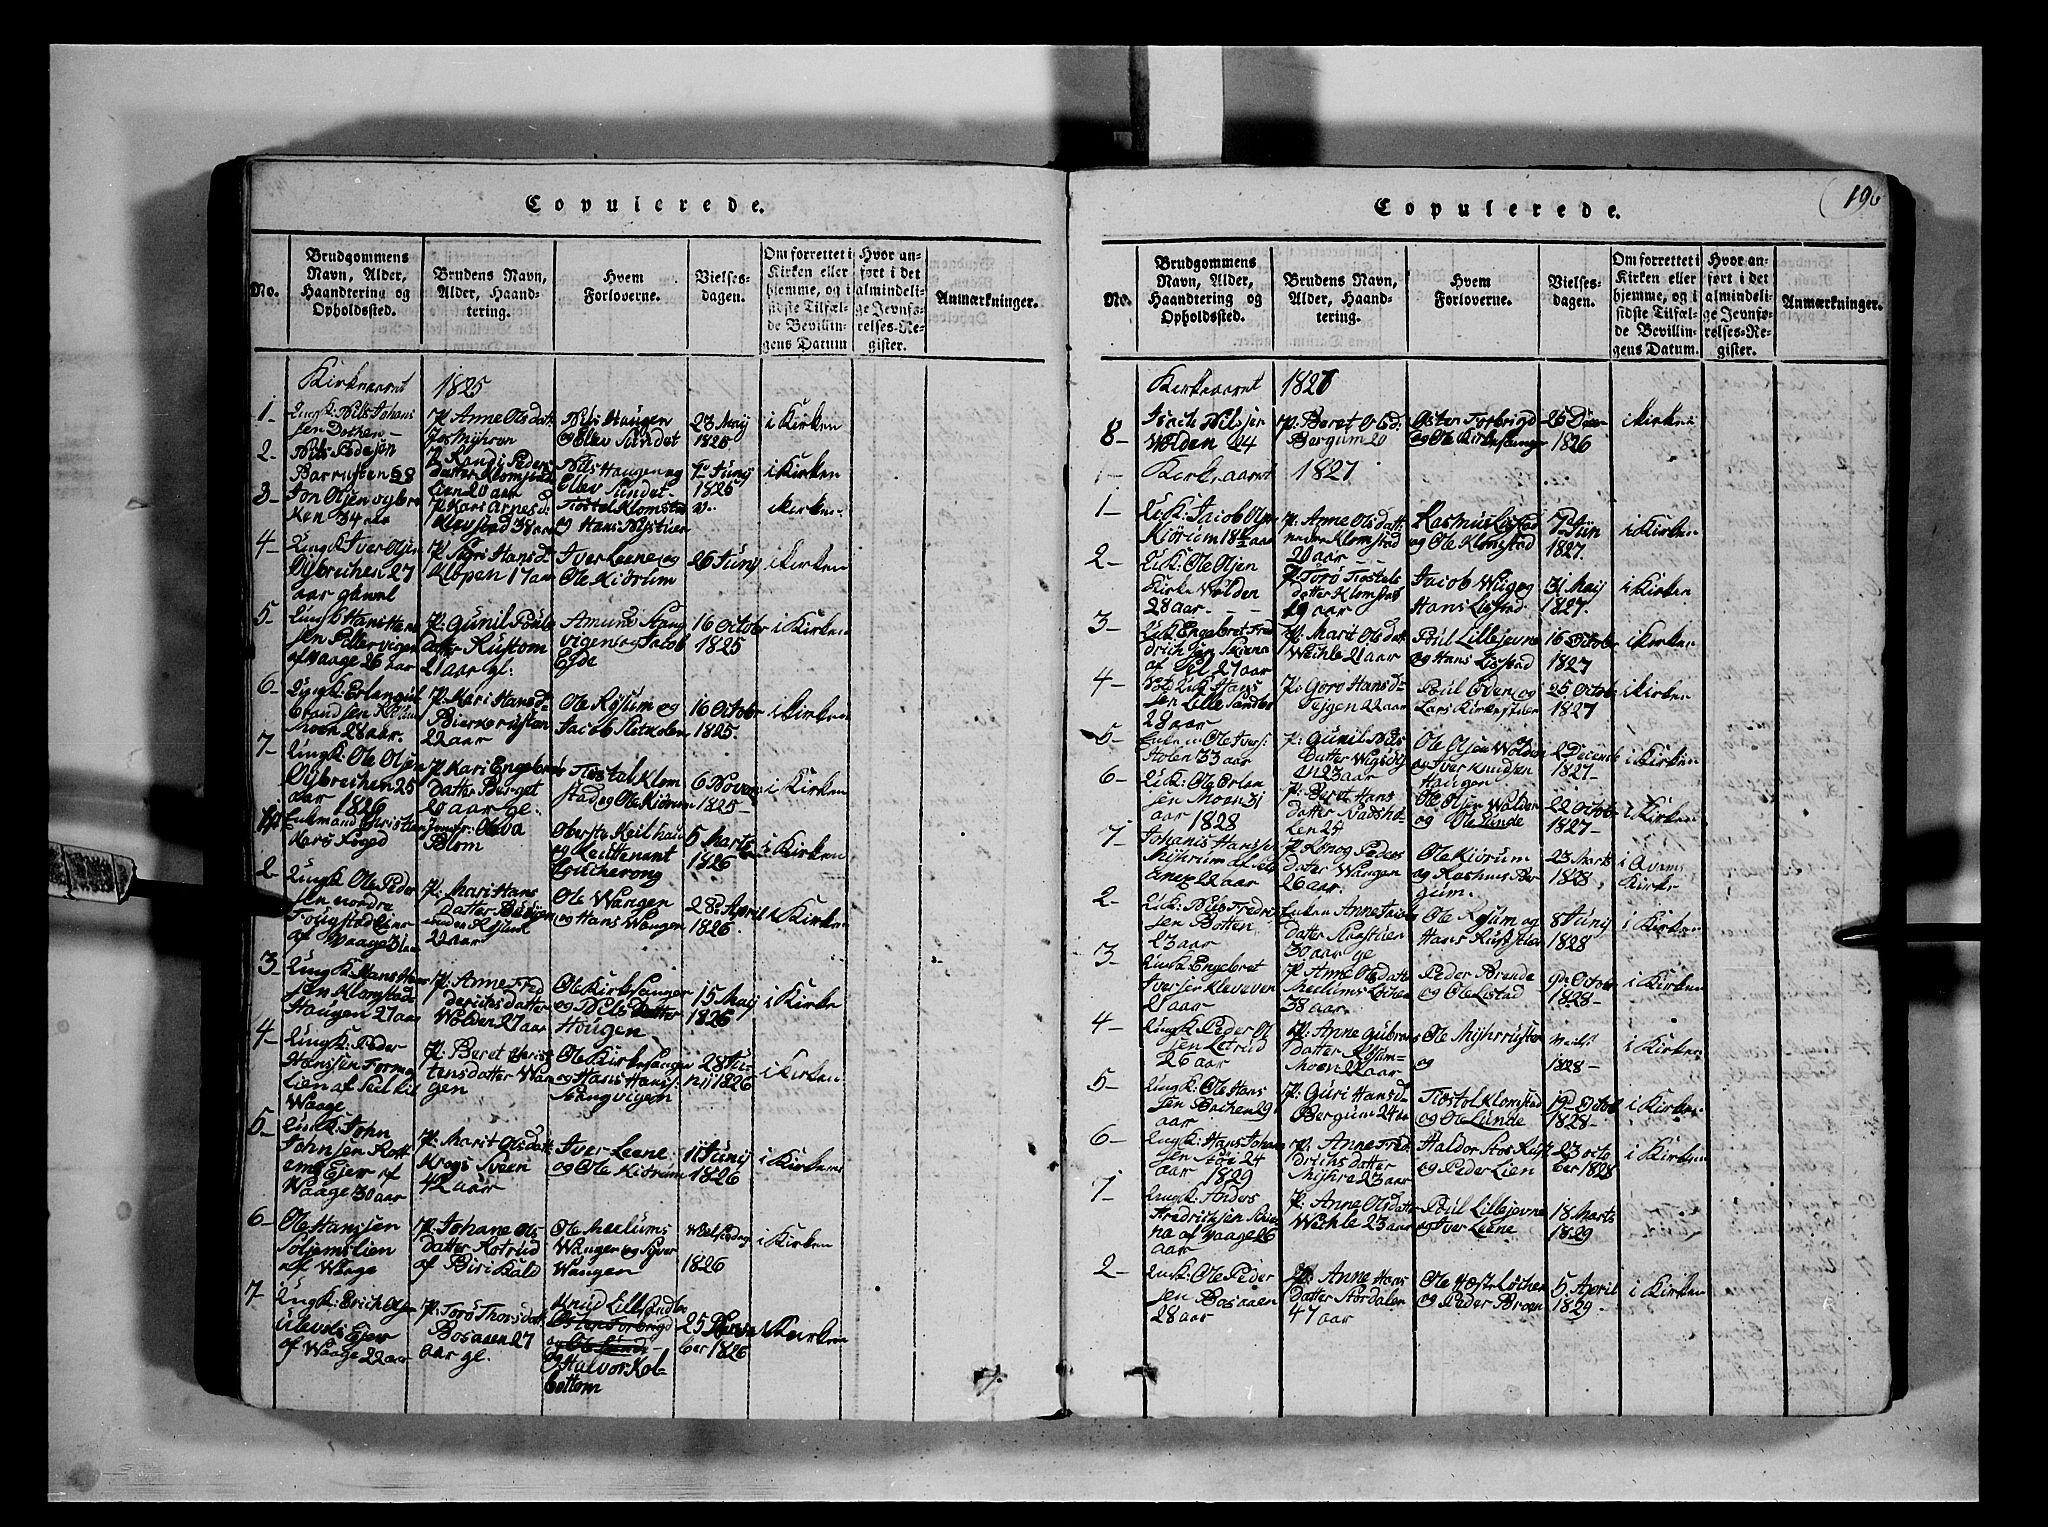 SAH, Fron prestekontor, H/Ha/Hab/L0002: Klokkerbok nr. 2, 1816-1850, s. 196